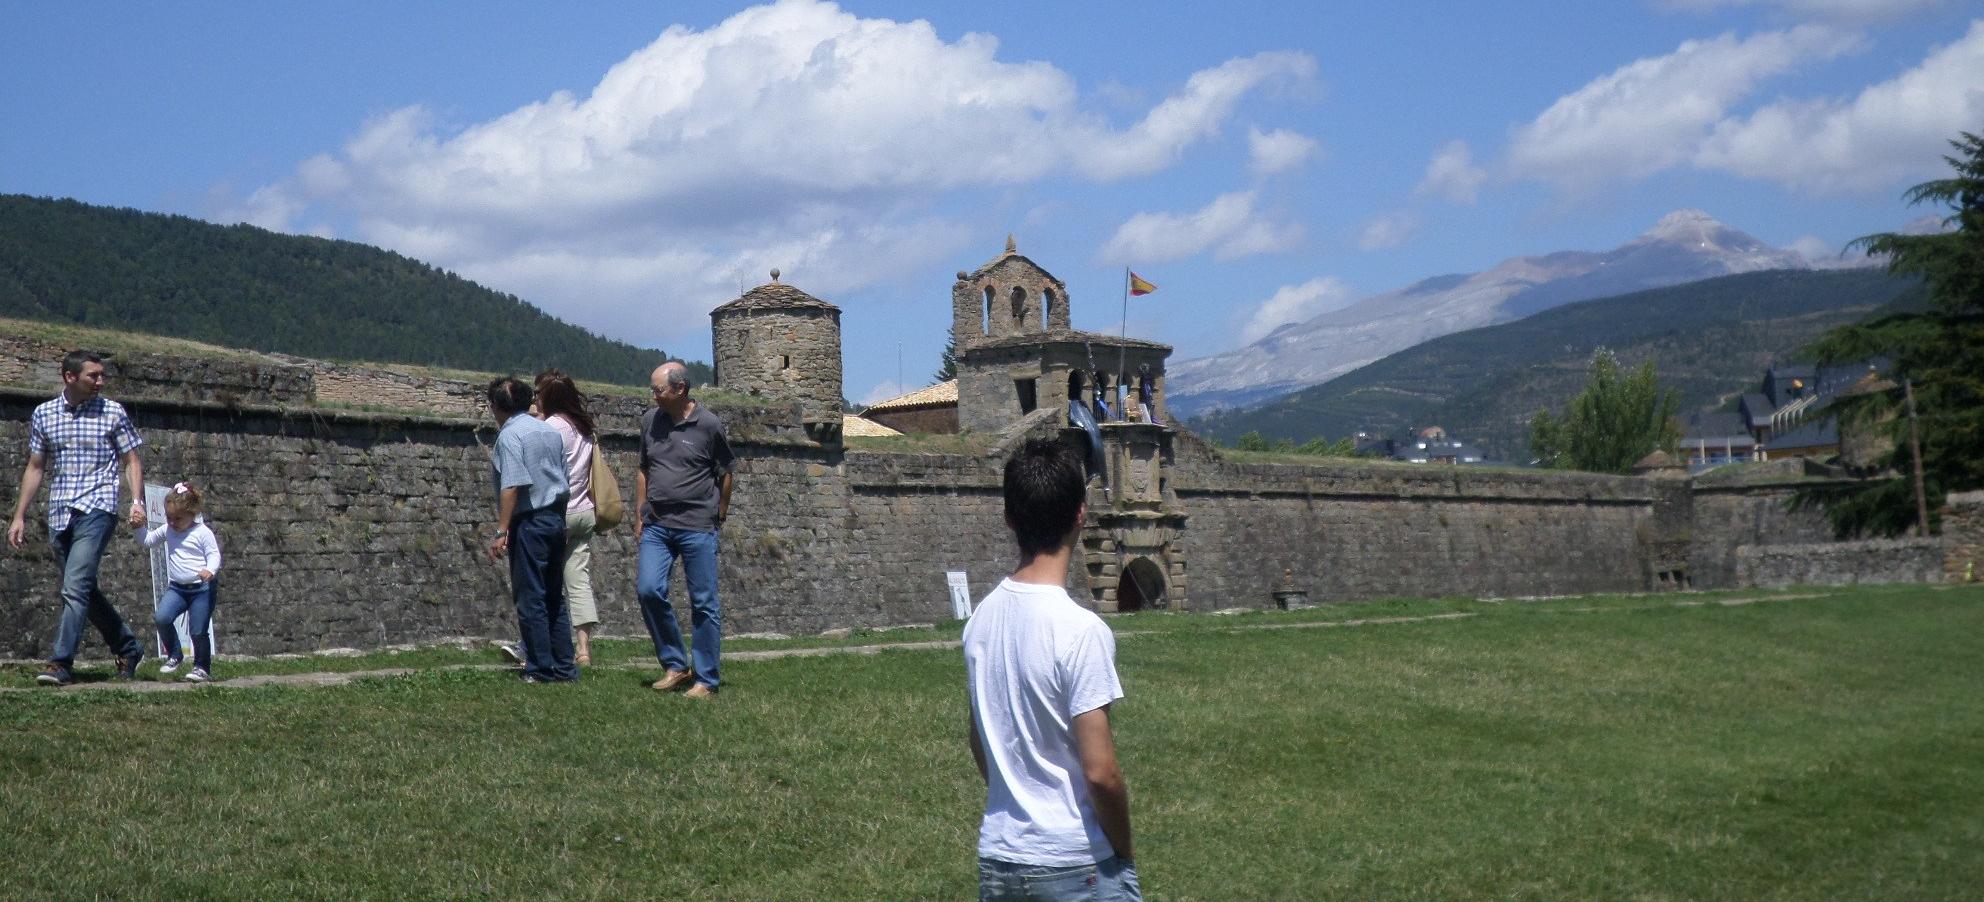 jaca-citadel-paseo-side-camino-aug14